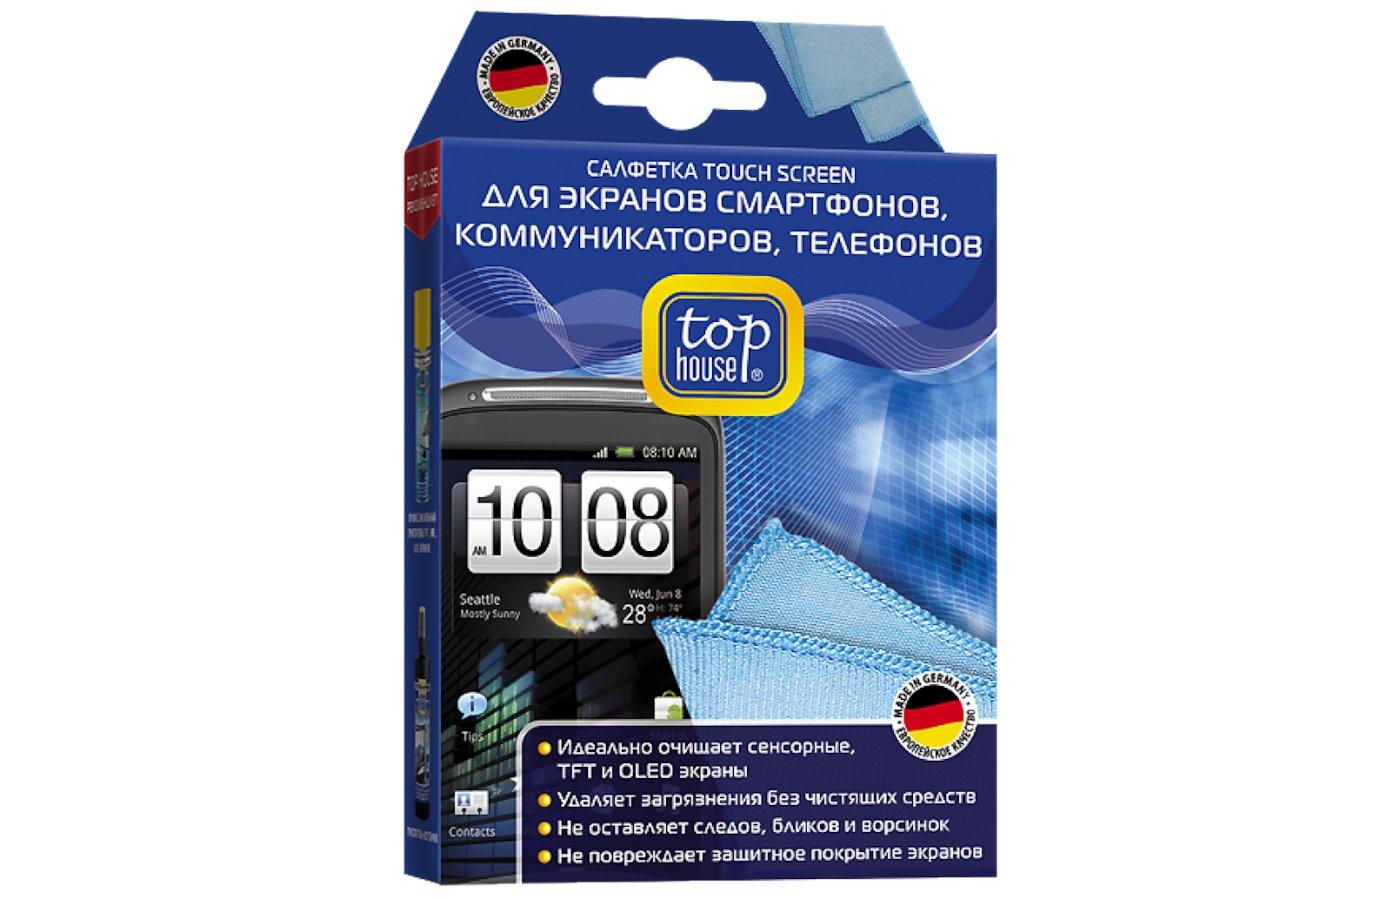 Чистящее средство ТОП ХАУС Салфетка TOUCH SCREEN для смартфонов 15х20см 320г/м2 (699845)